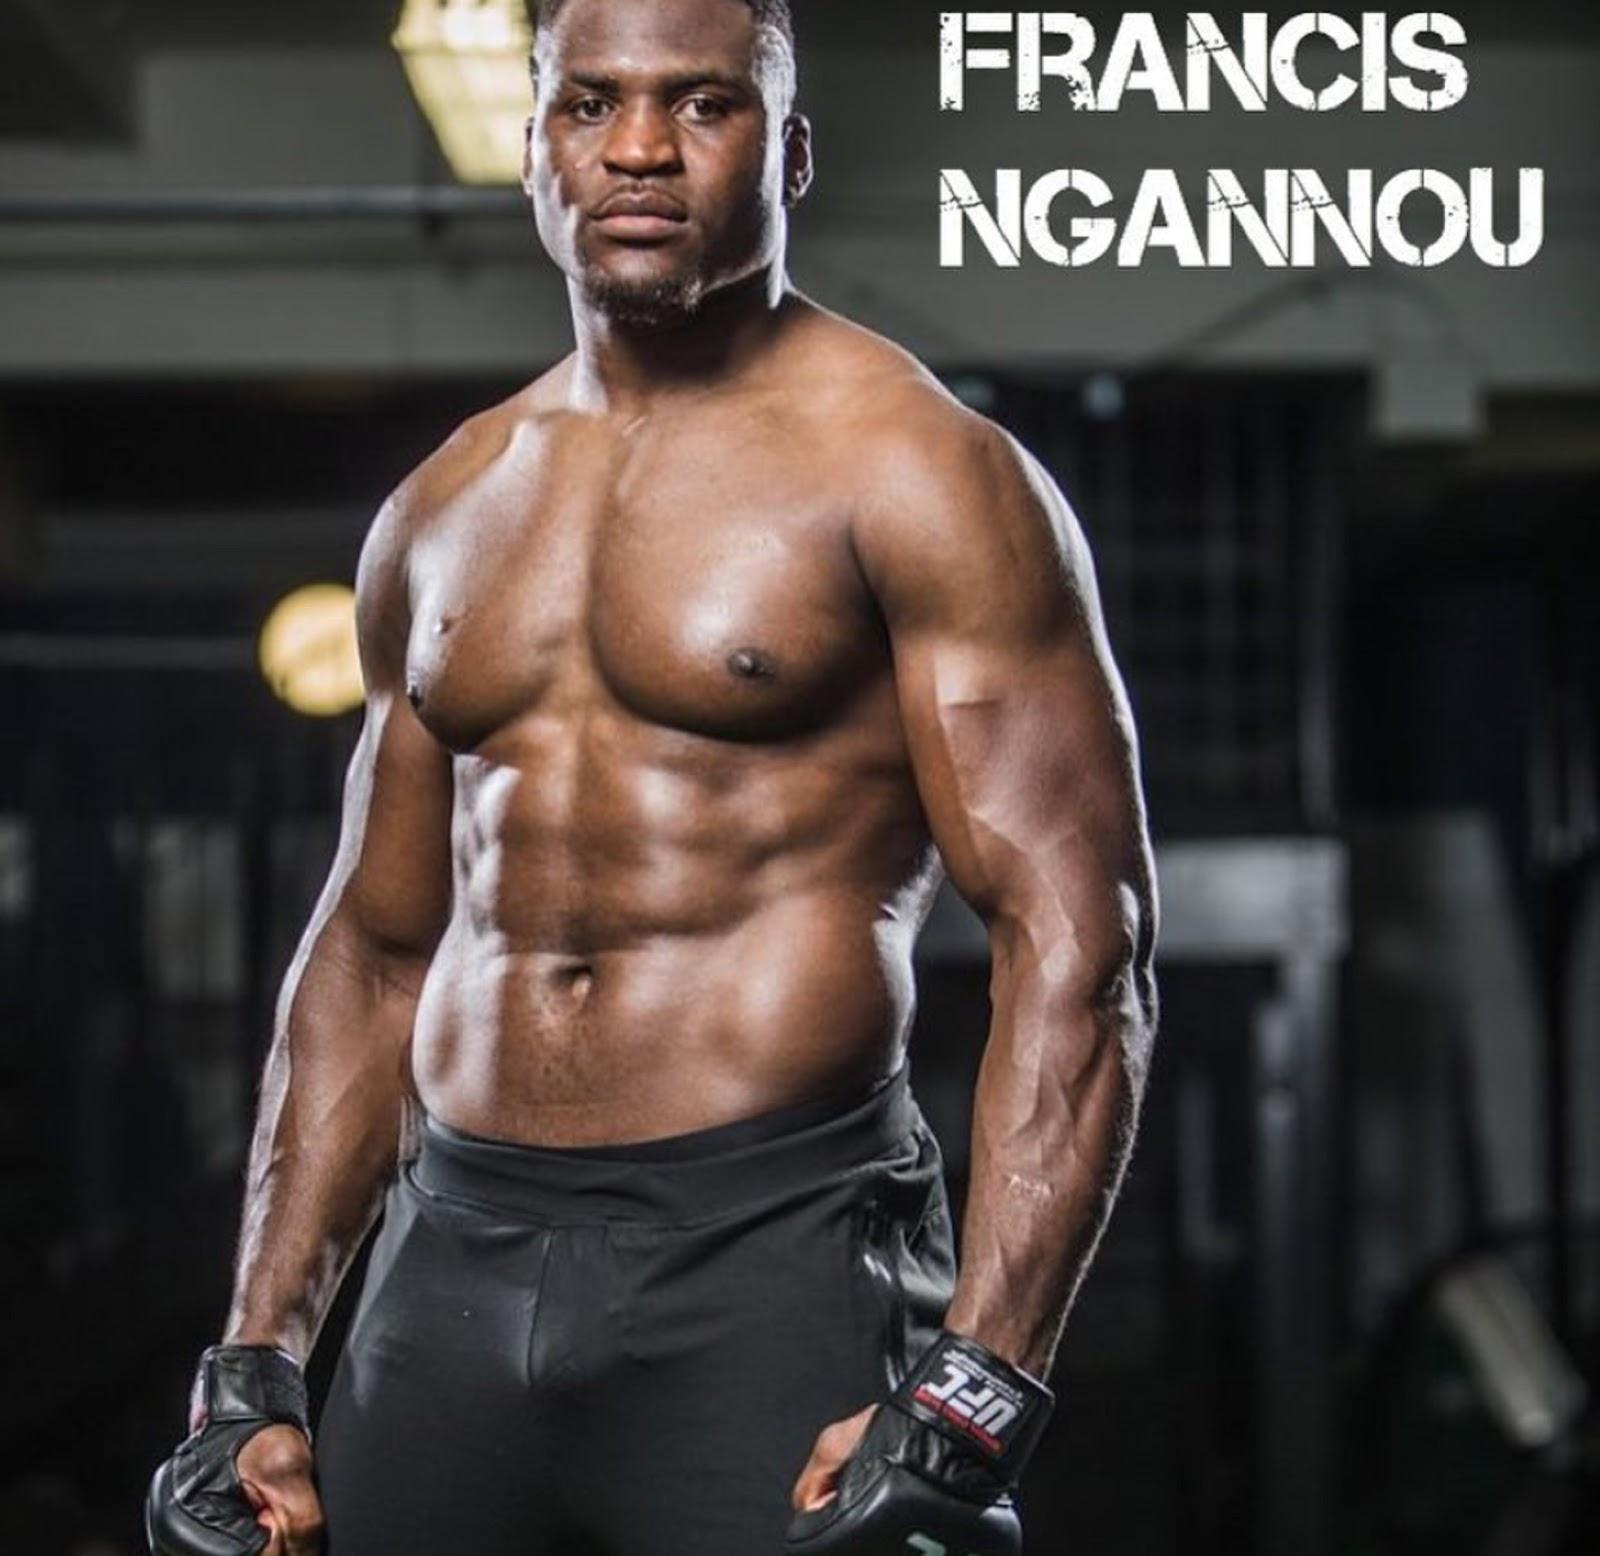 FRANCIS NGANNOU 10